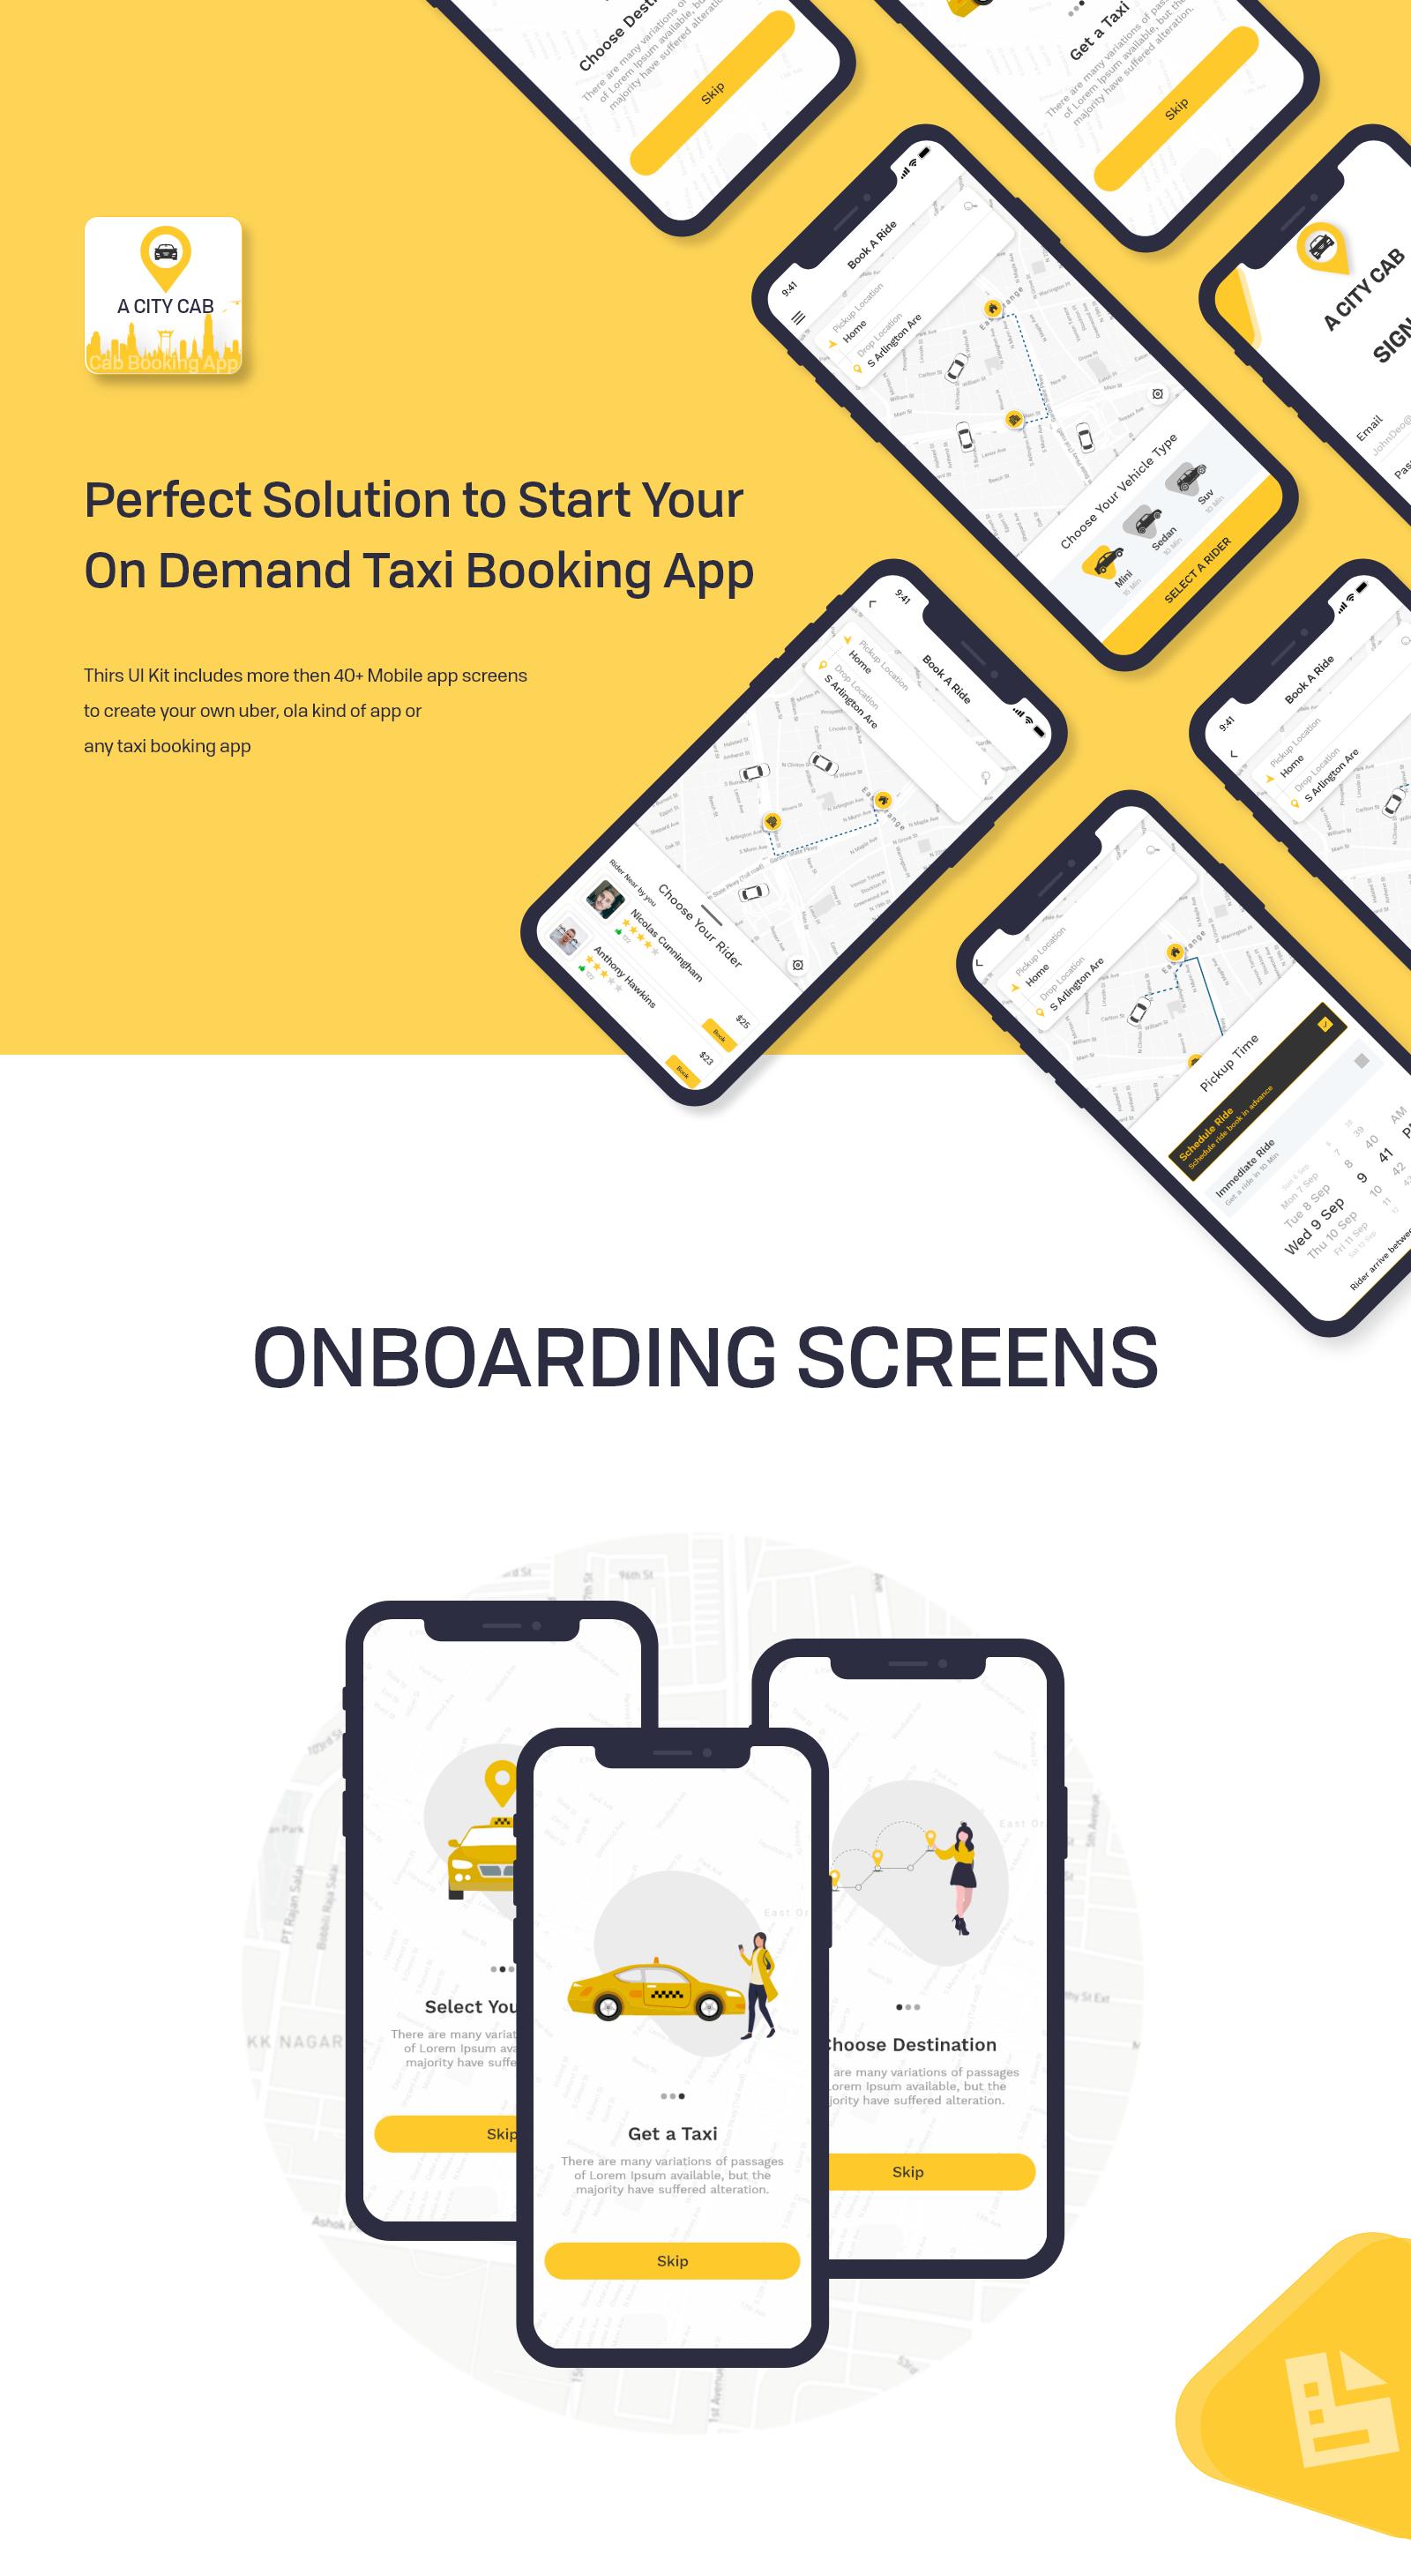 Citycab-ola-uber-taxi-booking-app-5